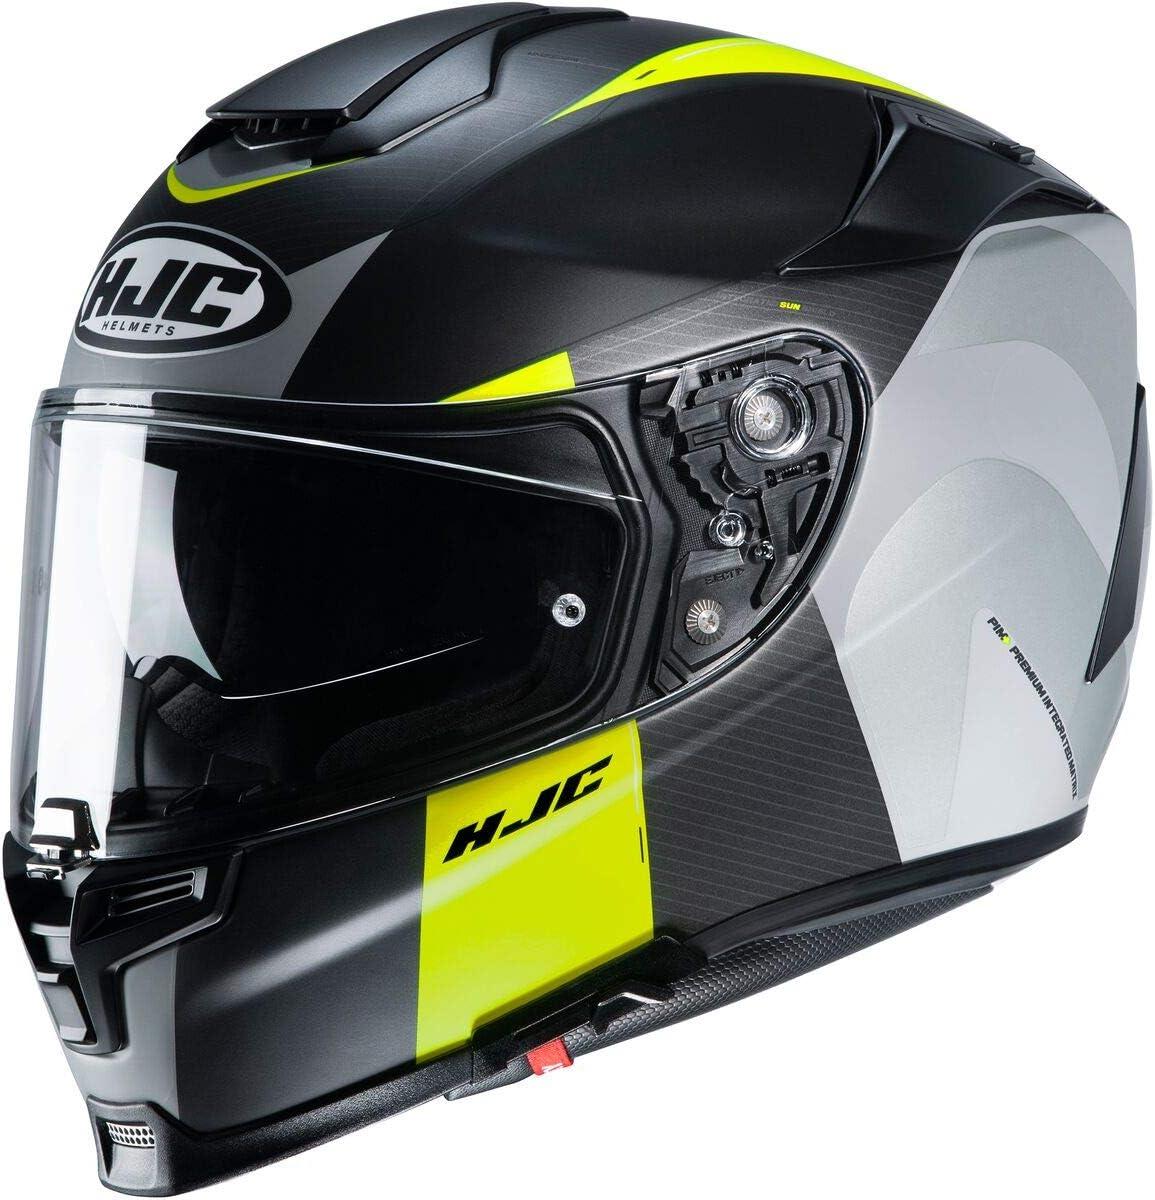 HJC Helmets RPHA New popularity 70 ST Wody Men's Motorcycle - Helmet MC- Street Dealing full price reduction